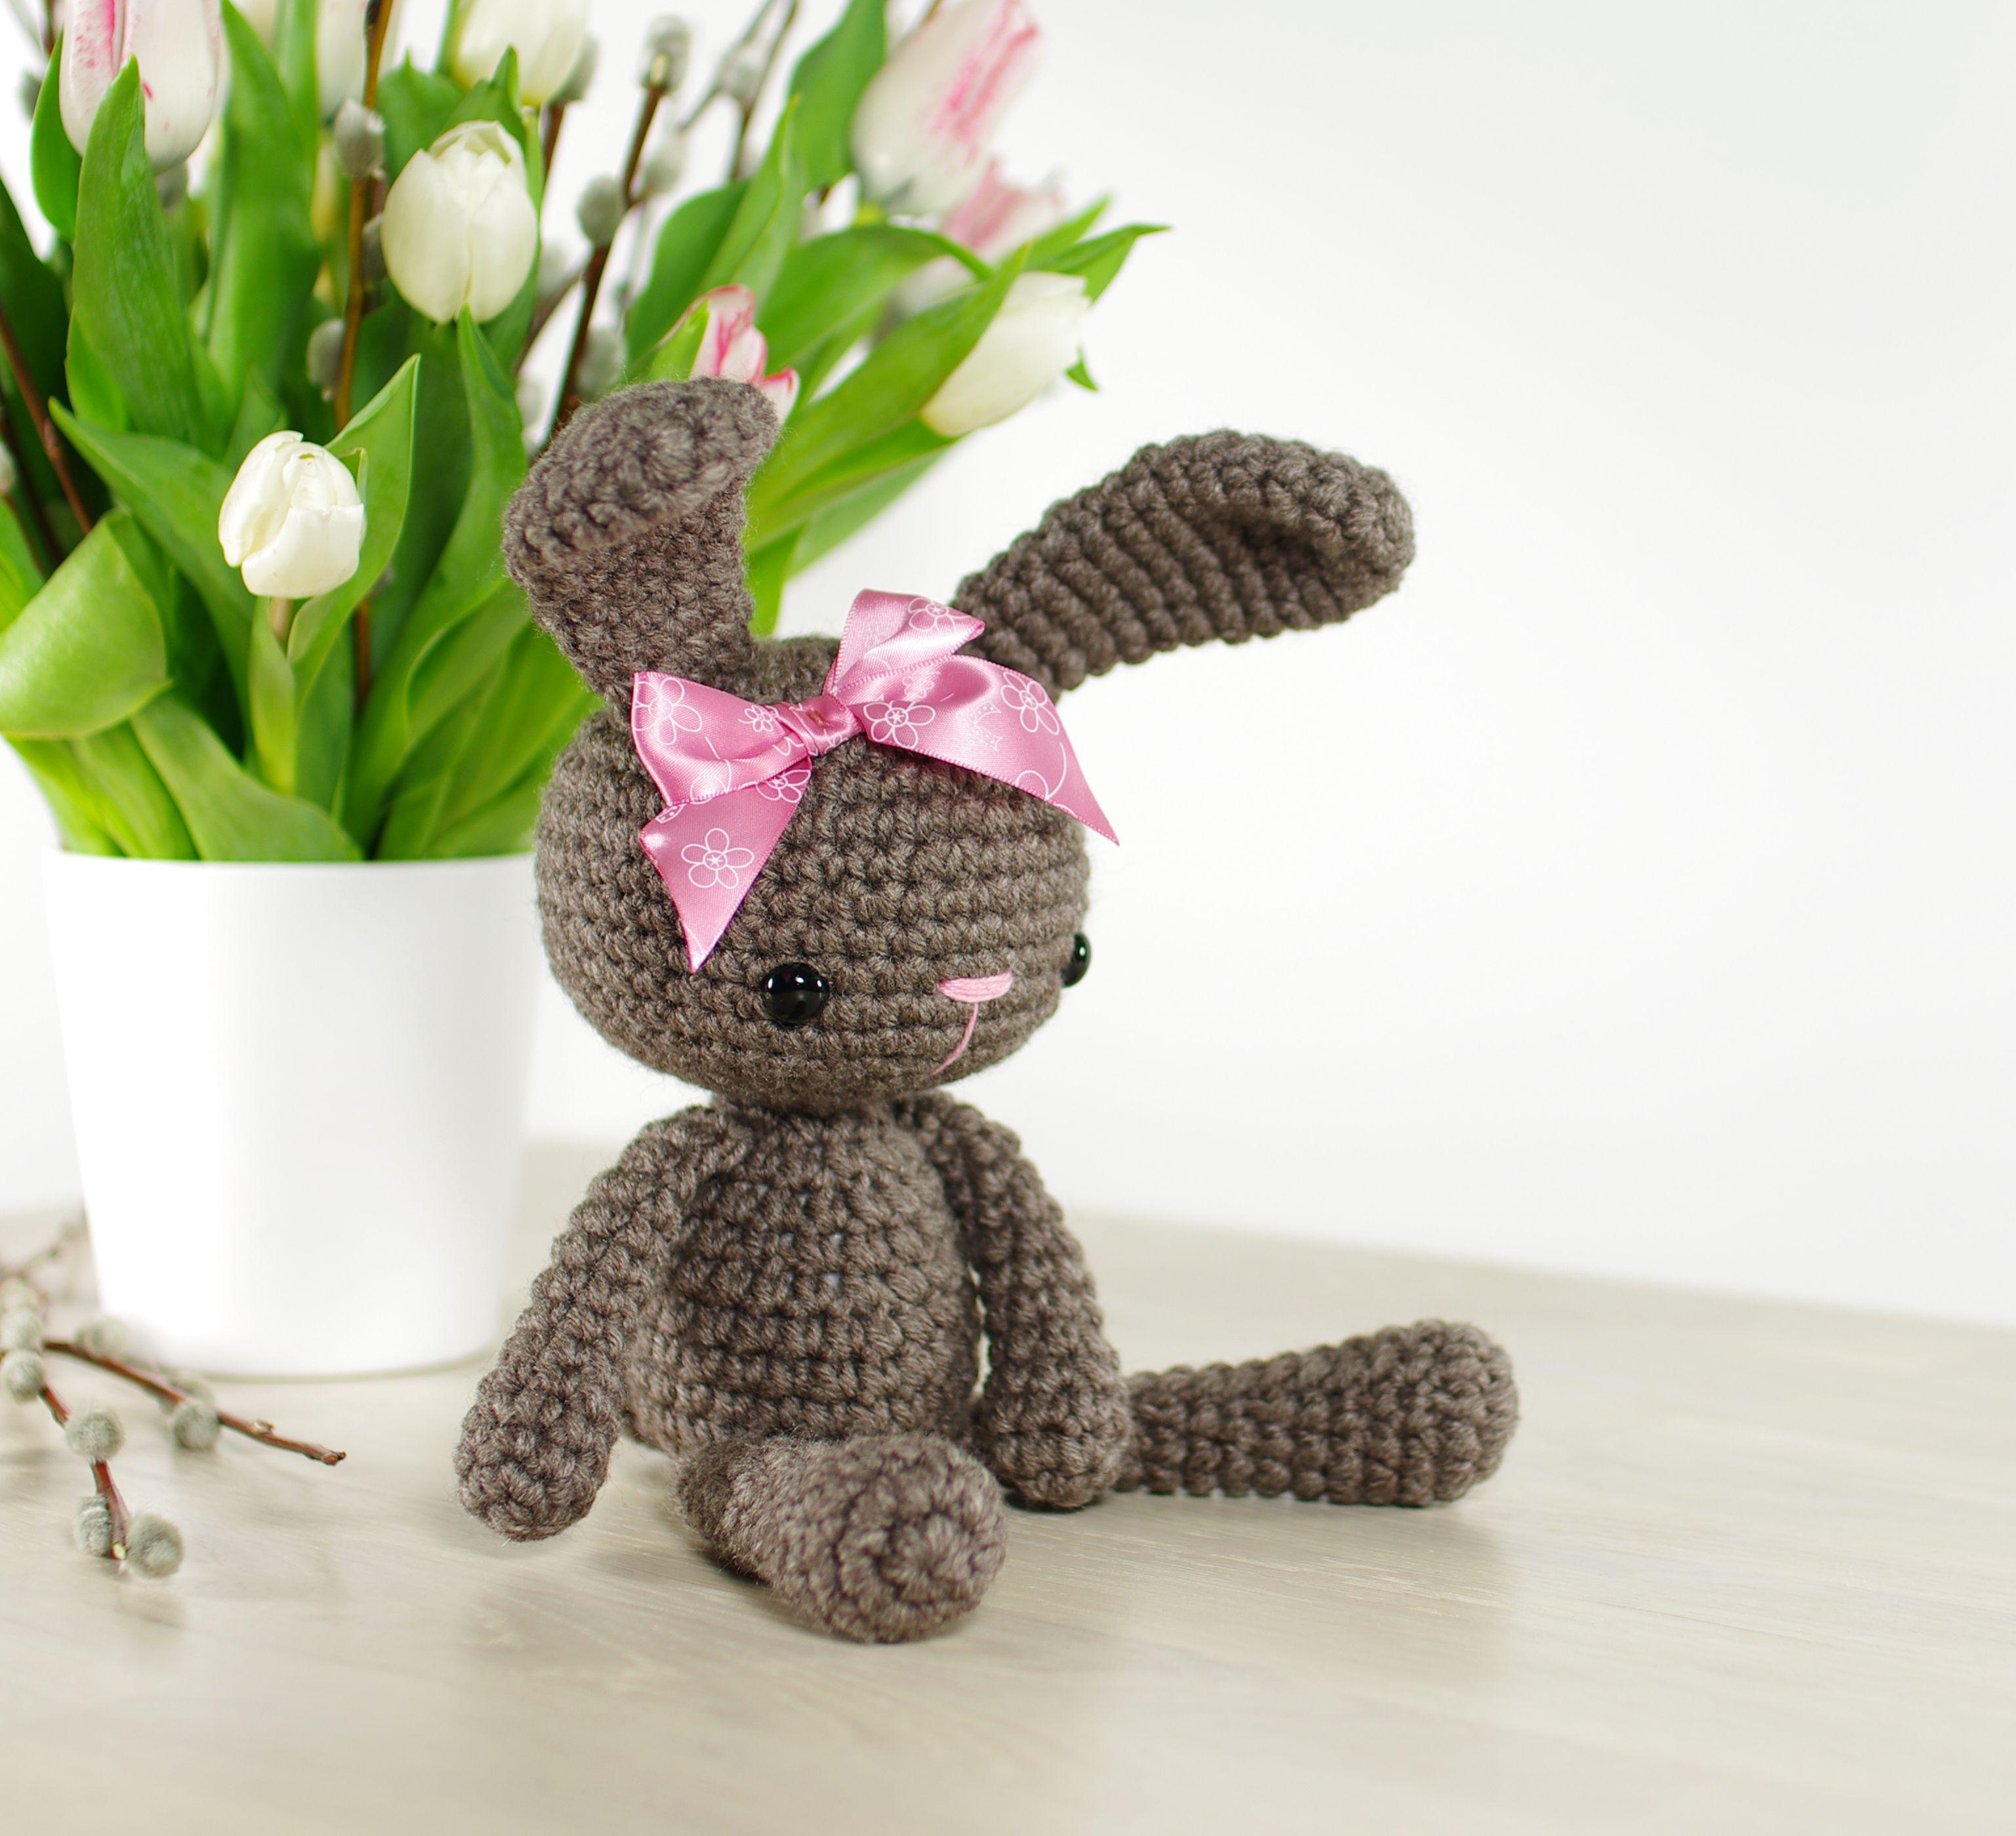 Free crochet pattern: Small amigurumi bunny // Kristi Tullus (spire ...